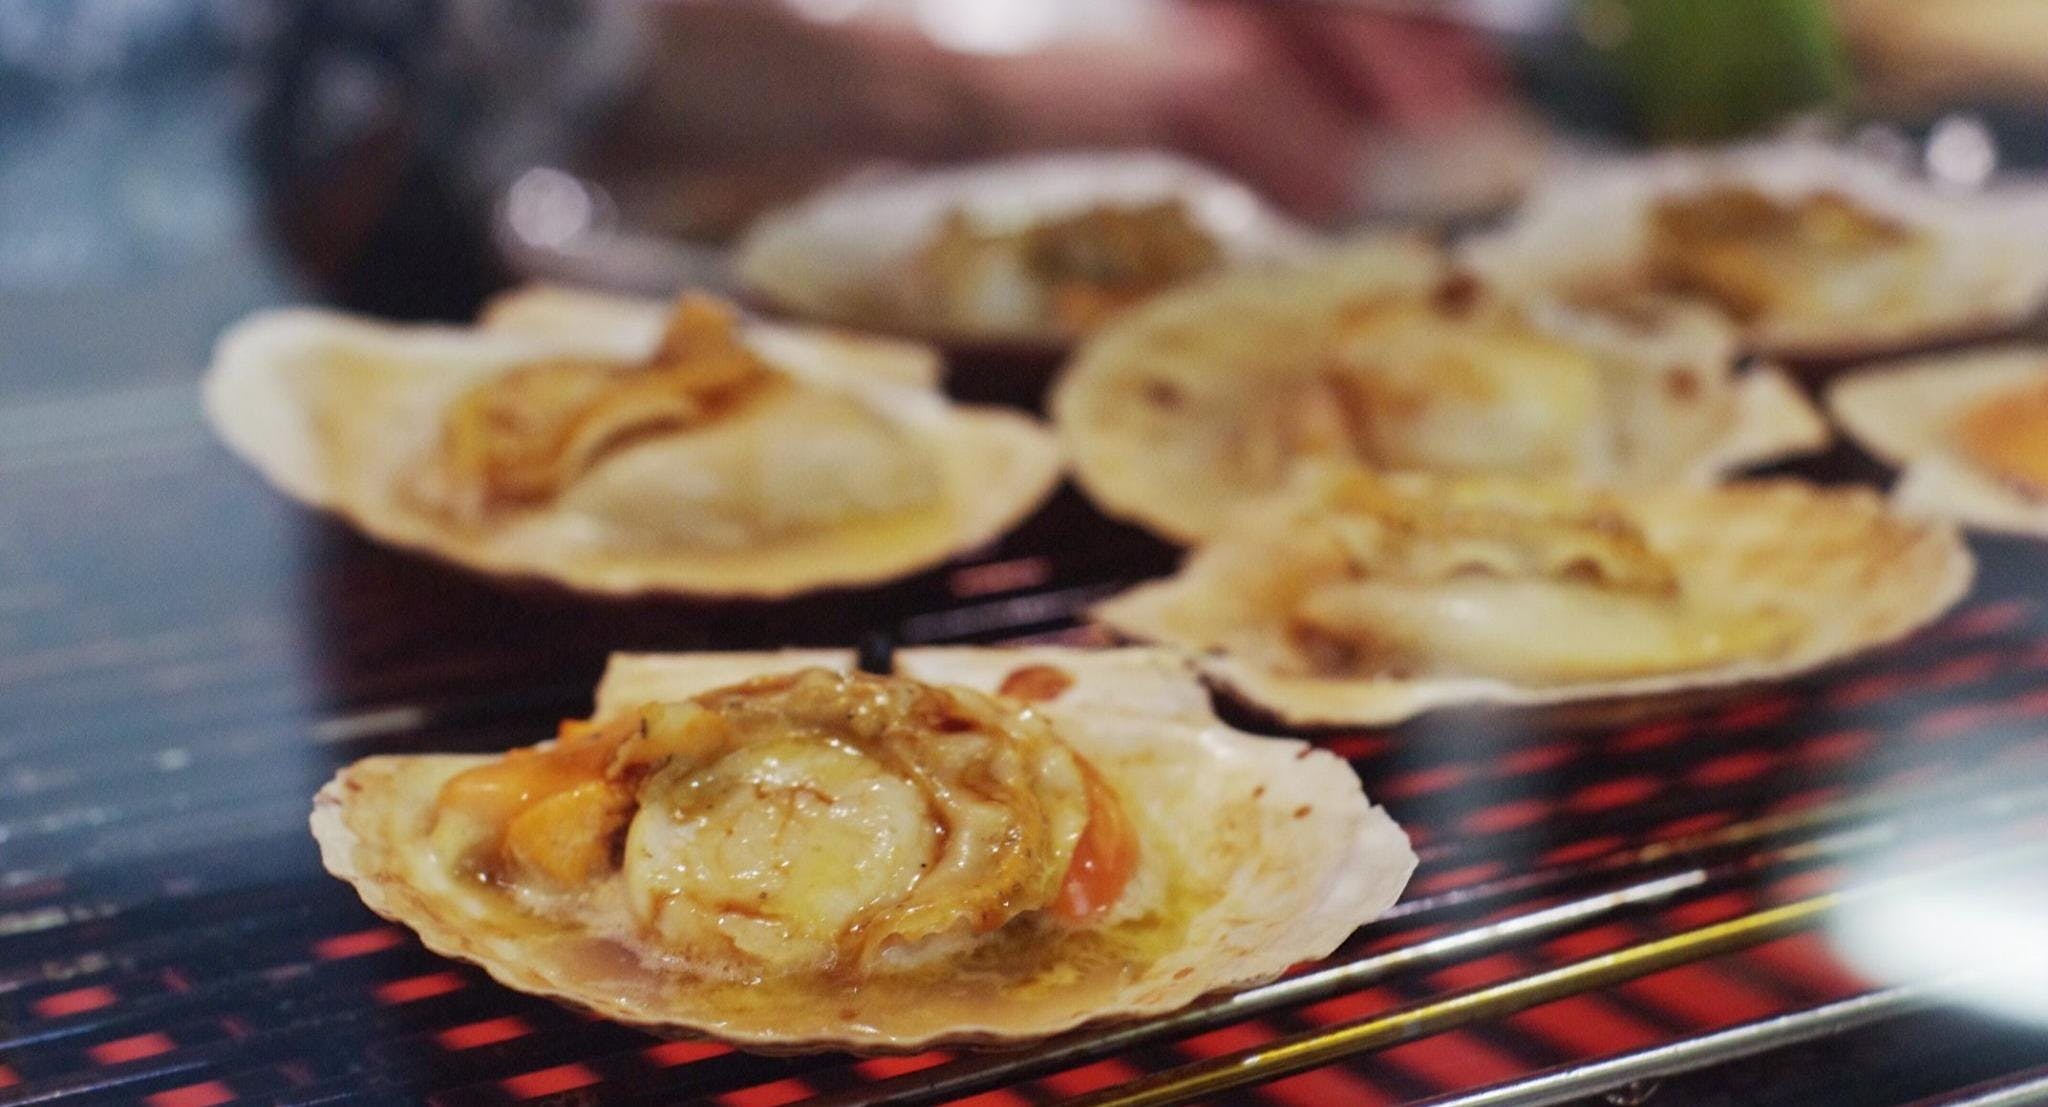 Watami Japanese Dining- Tuen Mun, 居食屋「和民